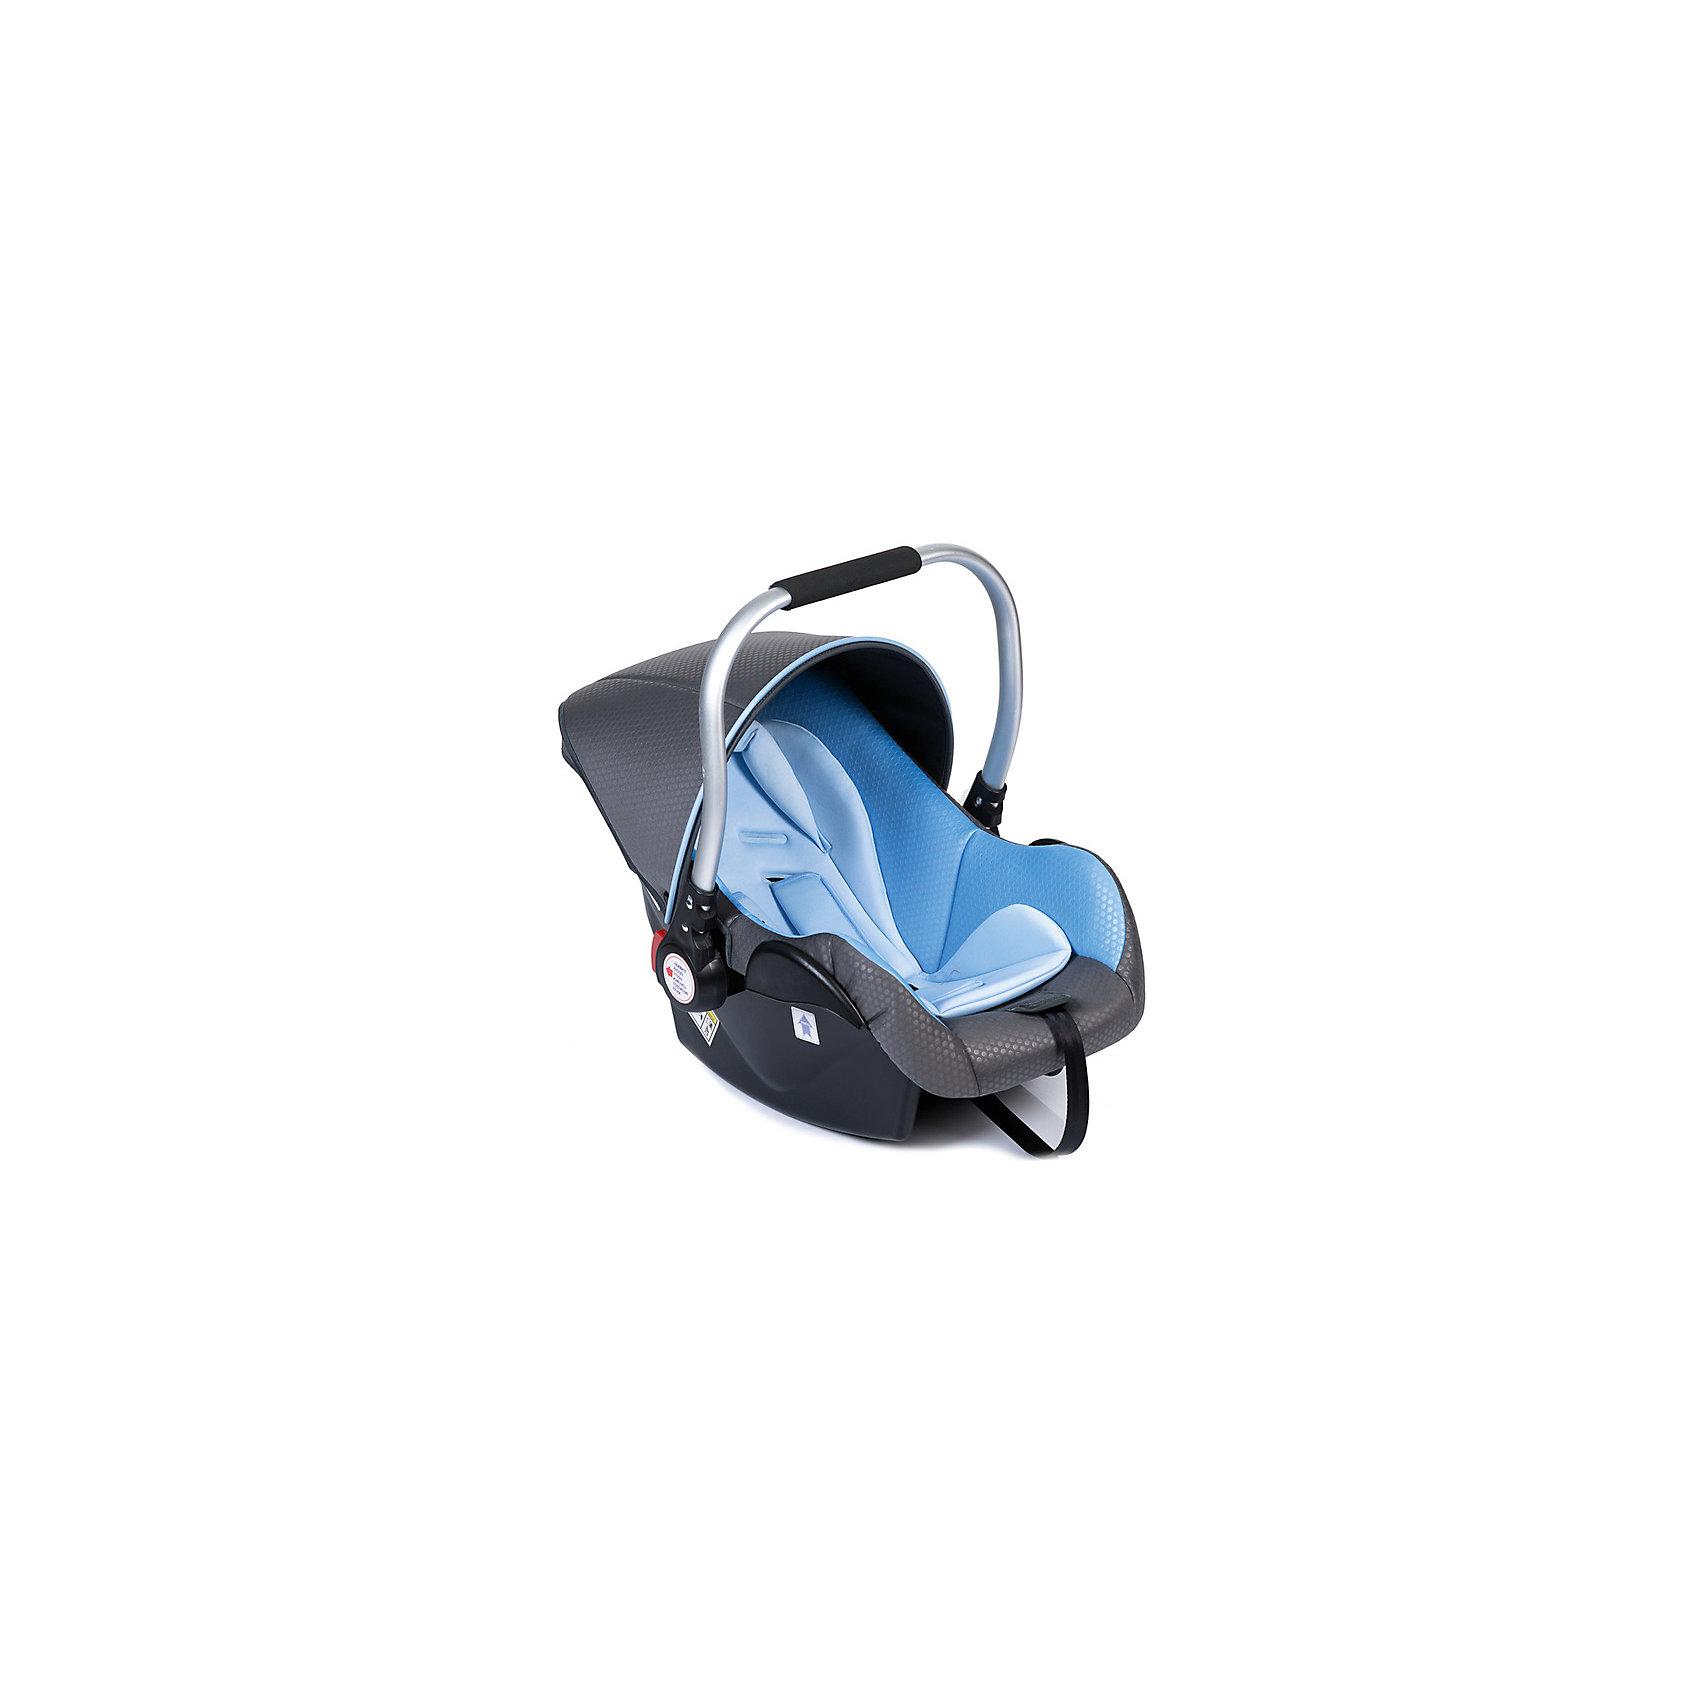 Baby Hit Автокресло PRIMARY, 0-13 кг., Babyhit, синий/серый группа 0 0 от 0 до 13 кг happy baby skyler